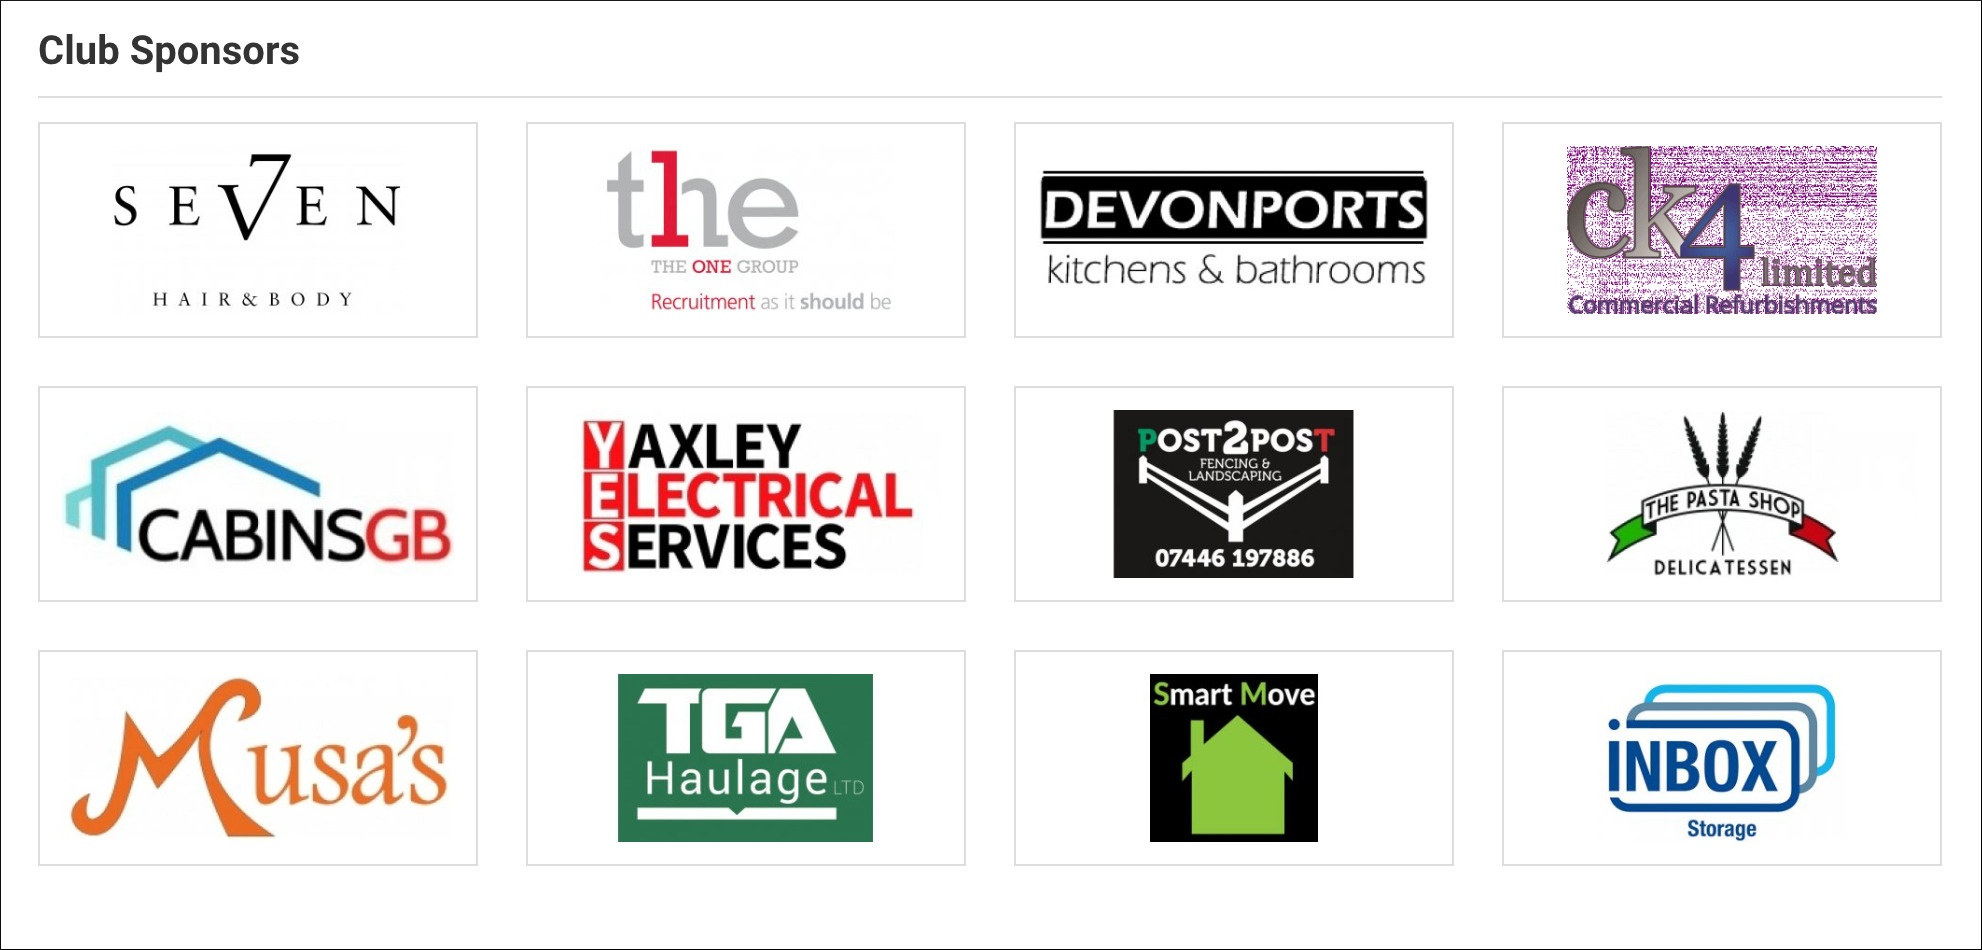 ICA Sponsors